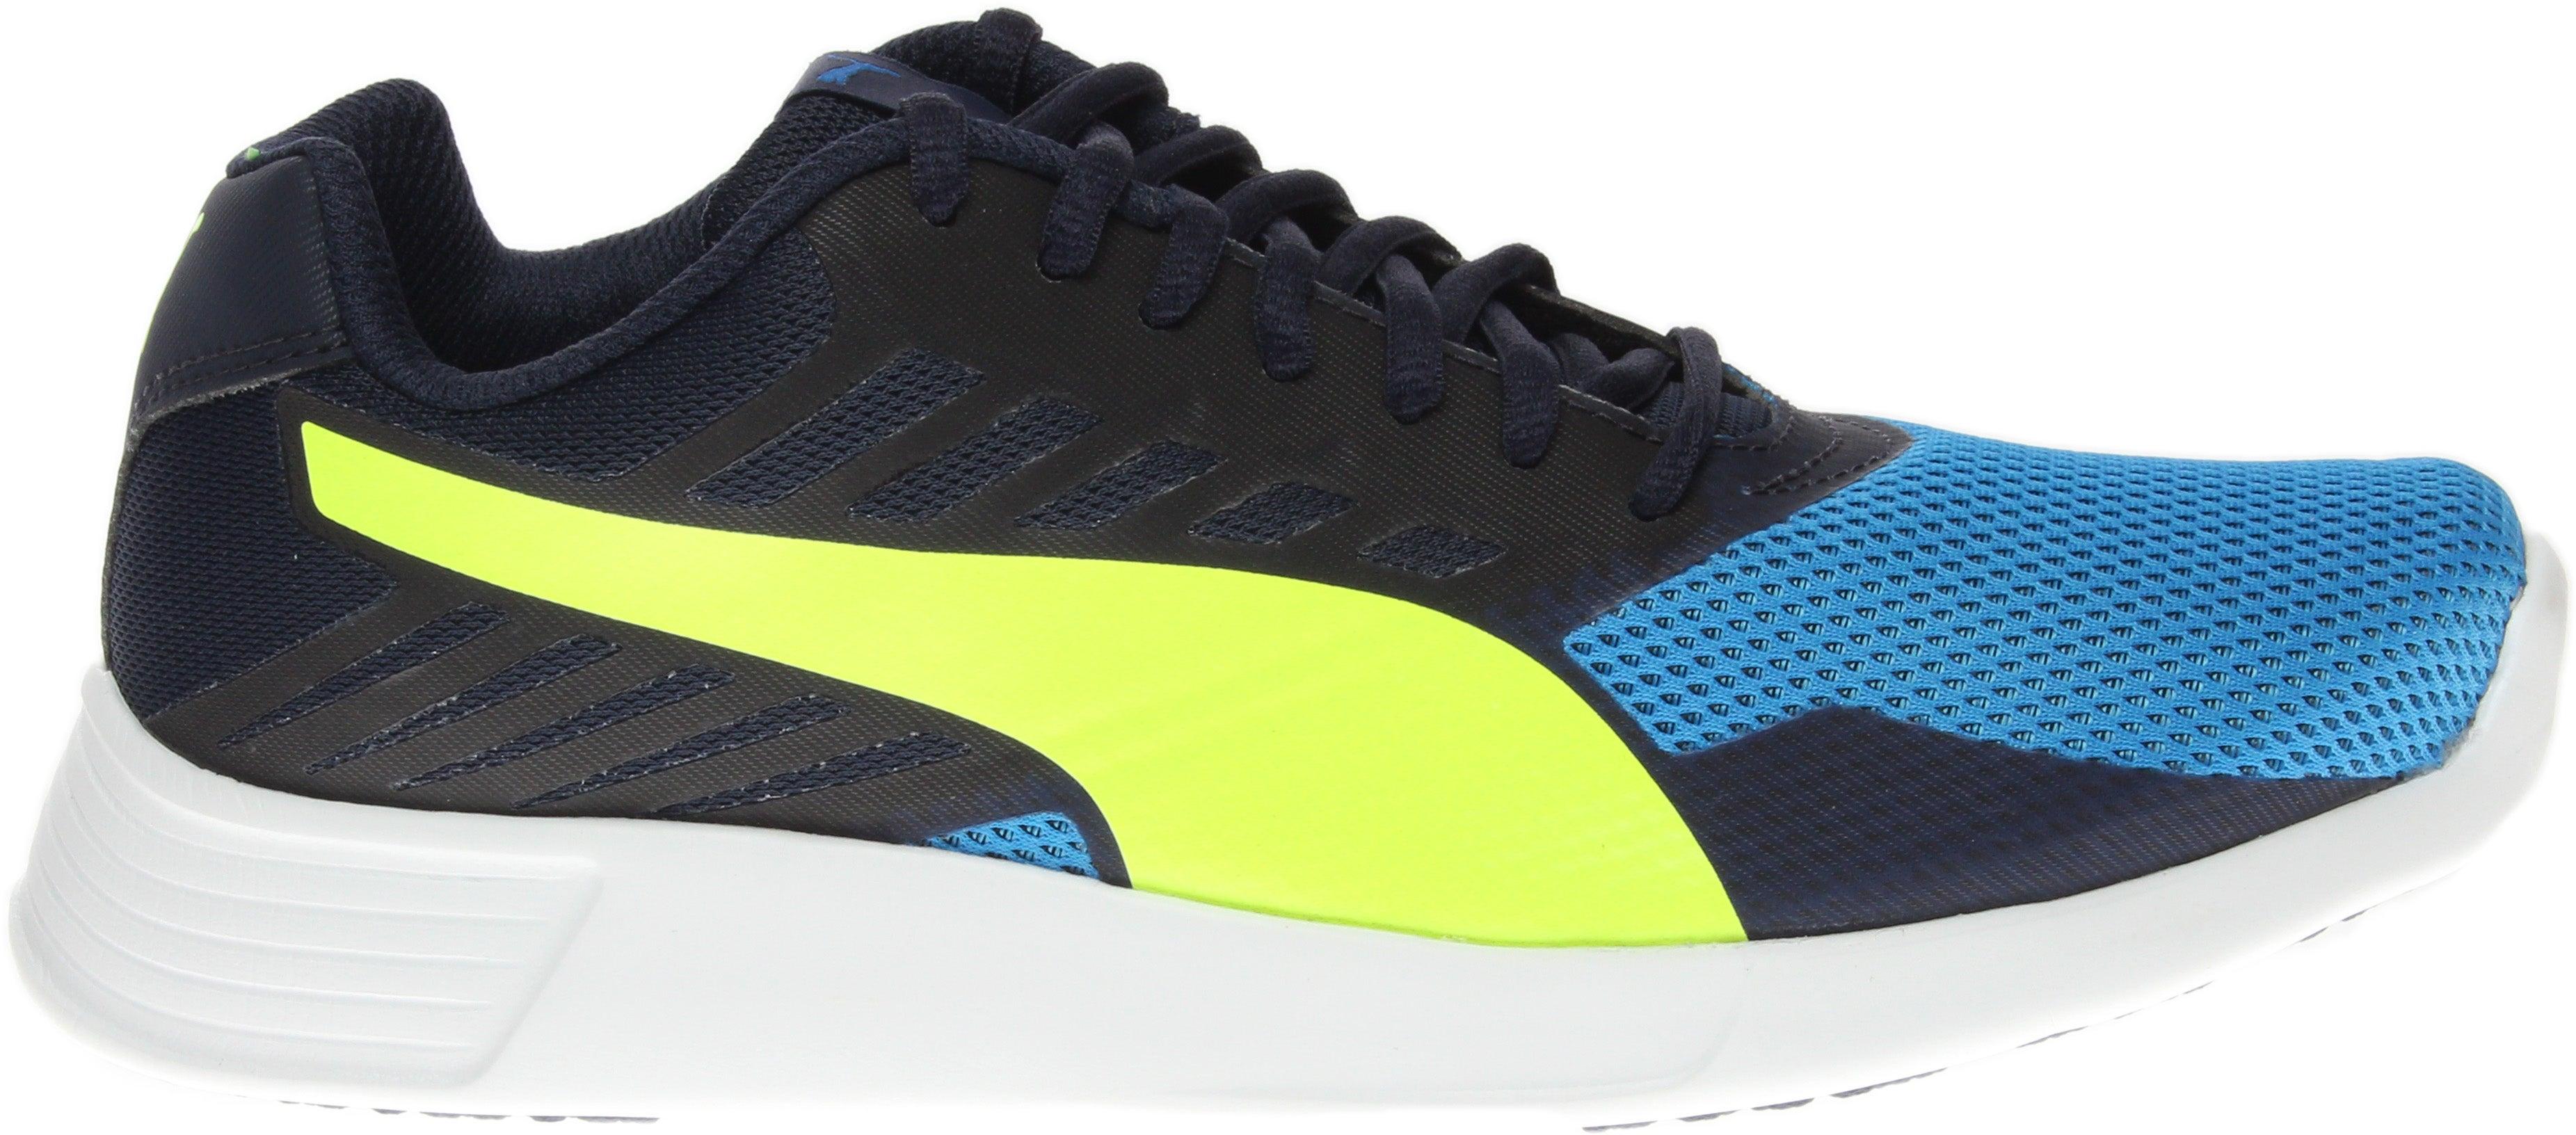 Puma ST Trainer Pro Blue - Mens  - Size